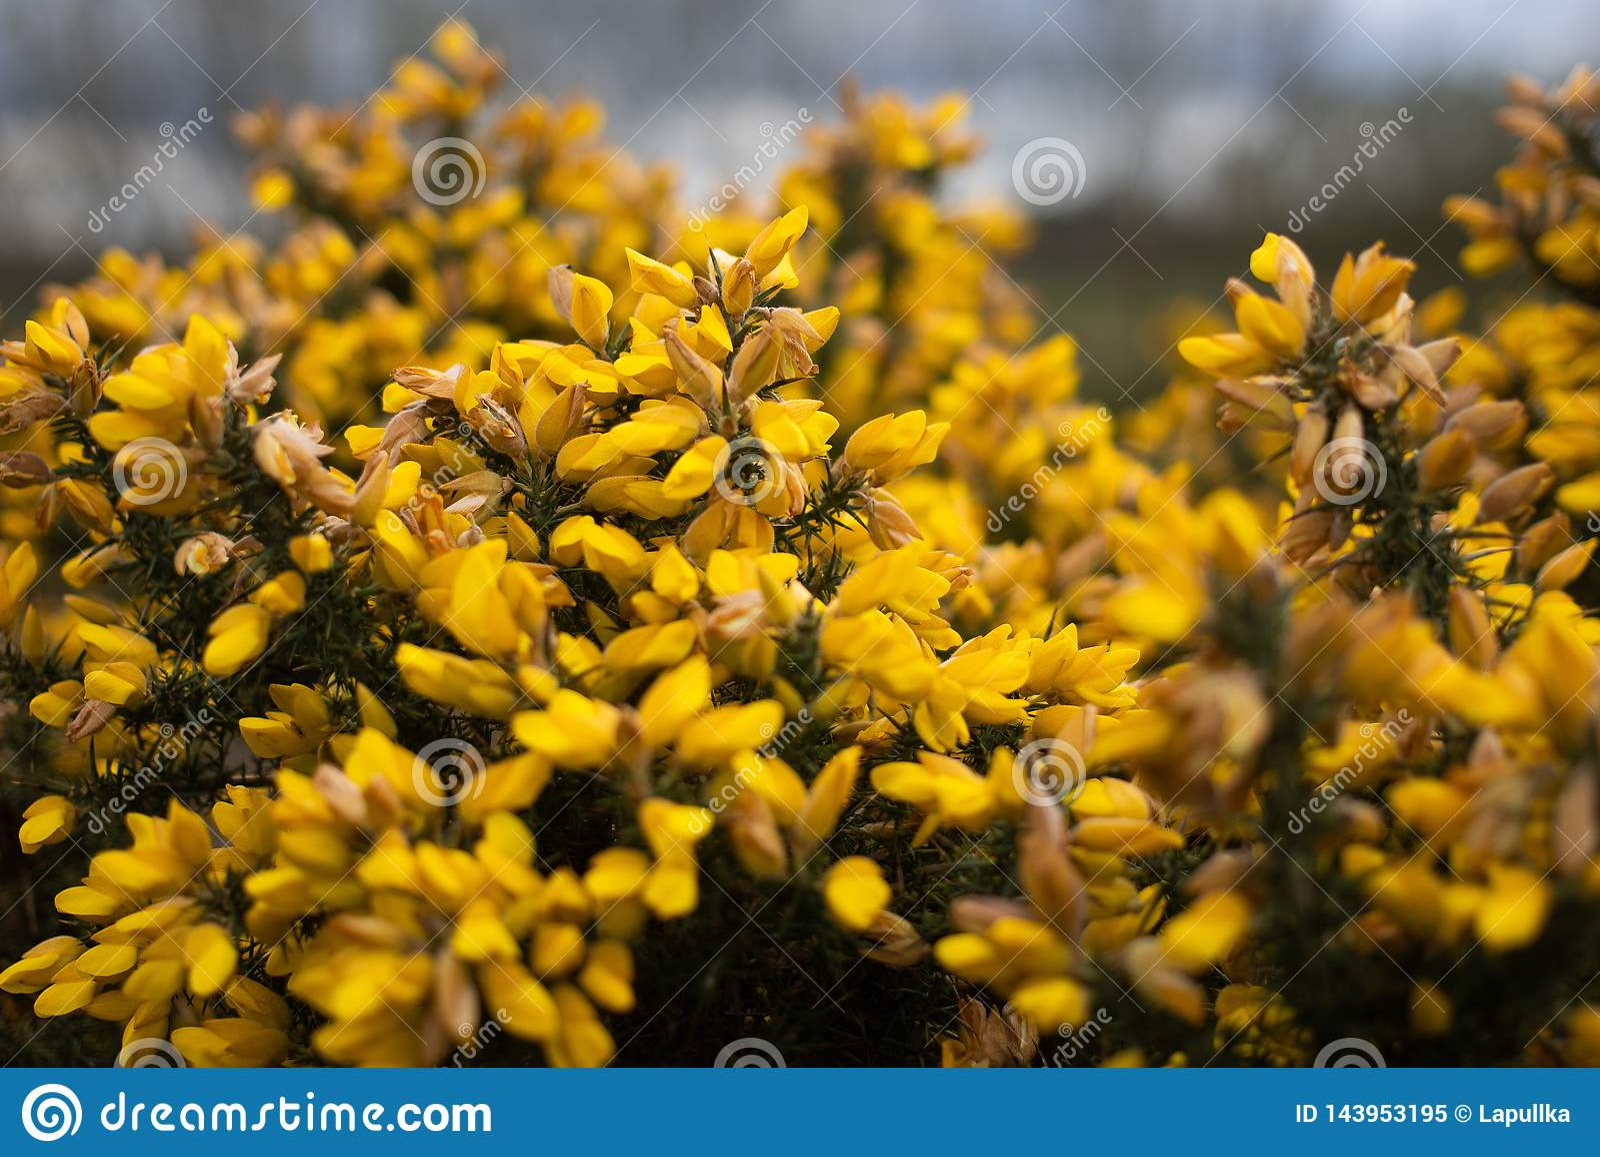 Forsythia plant blossom in Birmingham`s park